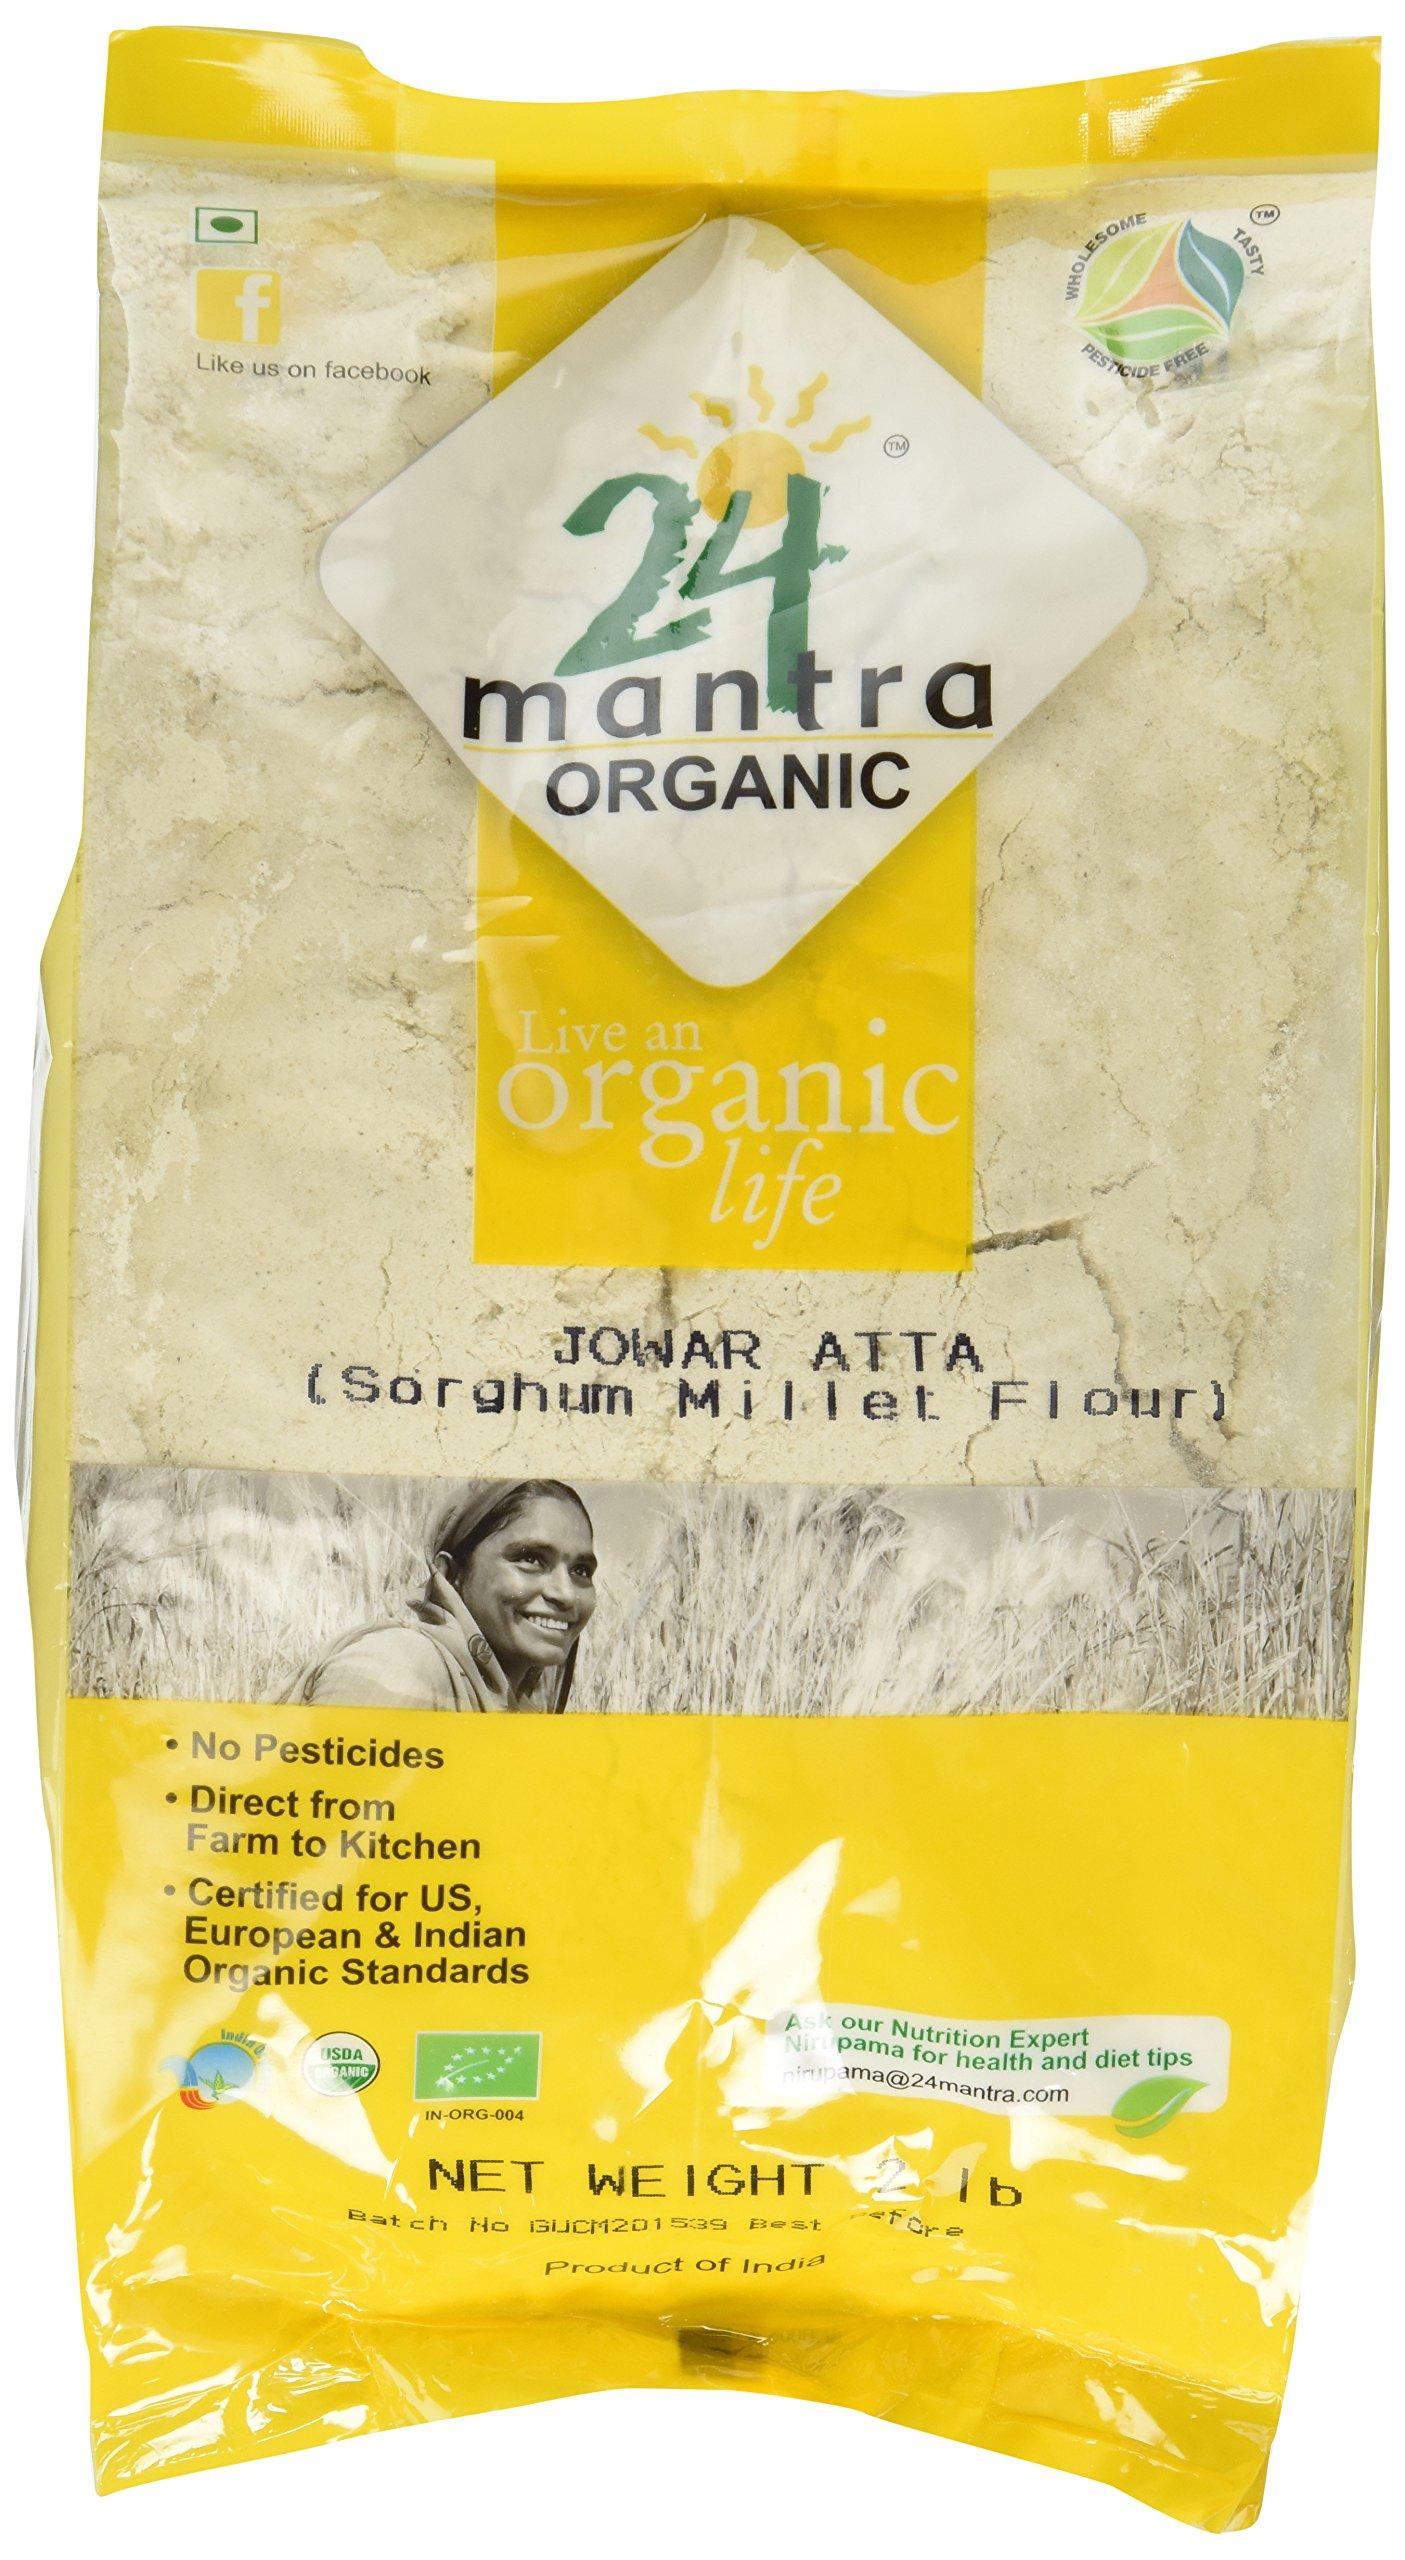 Organic Jowar Flour - Sorghum Flour Superfine - ★ USDA Certified Organic - ★ European Union Certified Organic - ★ Pesticides Free - ★ Adulteration Free - ★ Sodium Free - 2 Lbs - 24 Mantra Organic